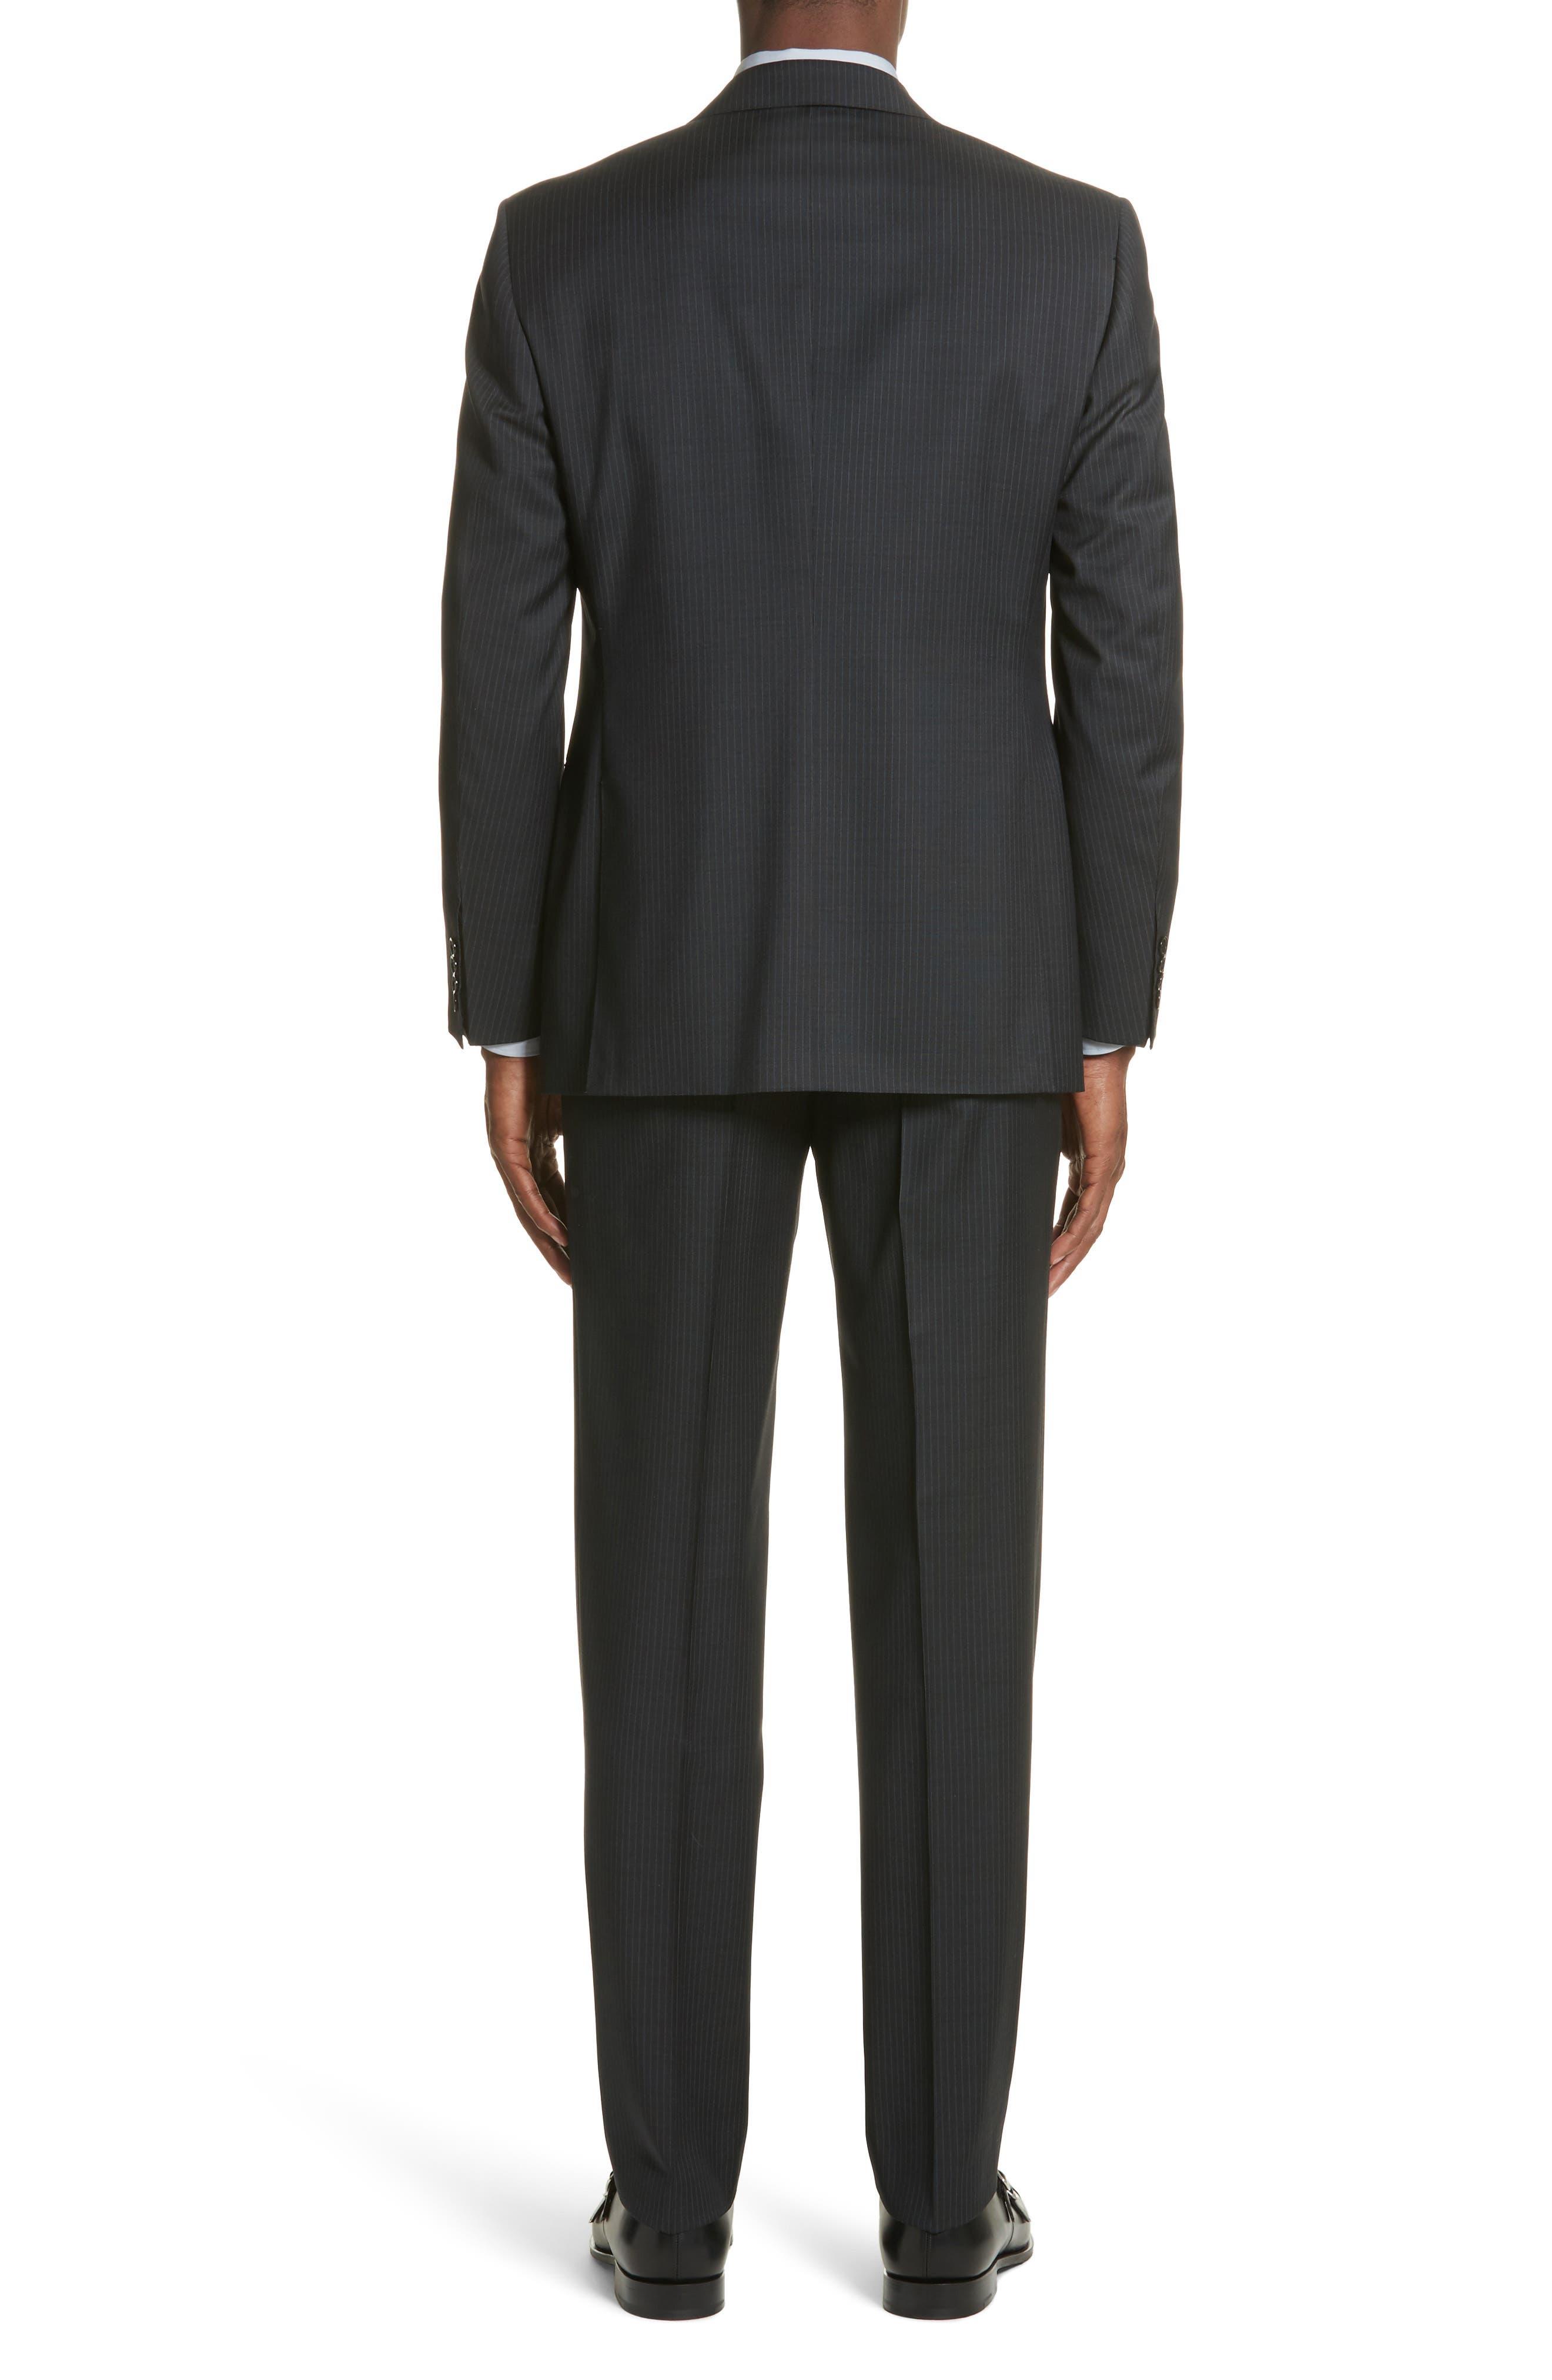 CANALI,                             Classic Fit Stripe Wool Suit,                             Alternate thumbnail 2, color,                             010